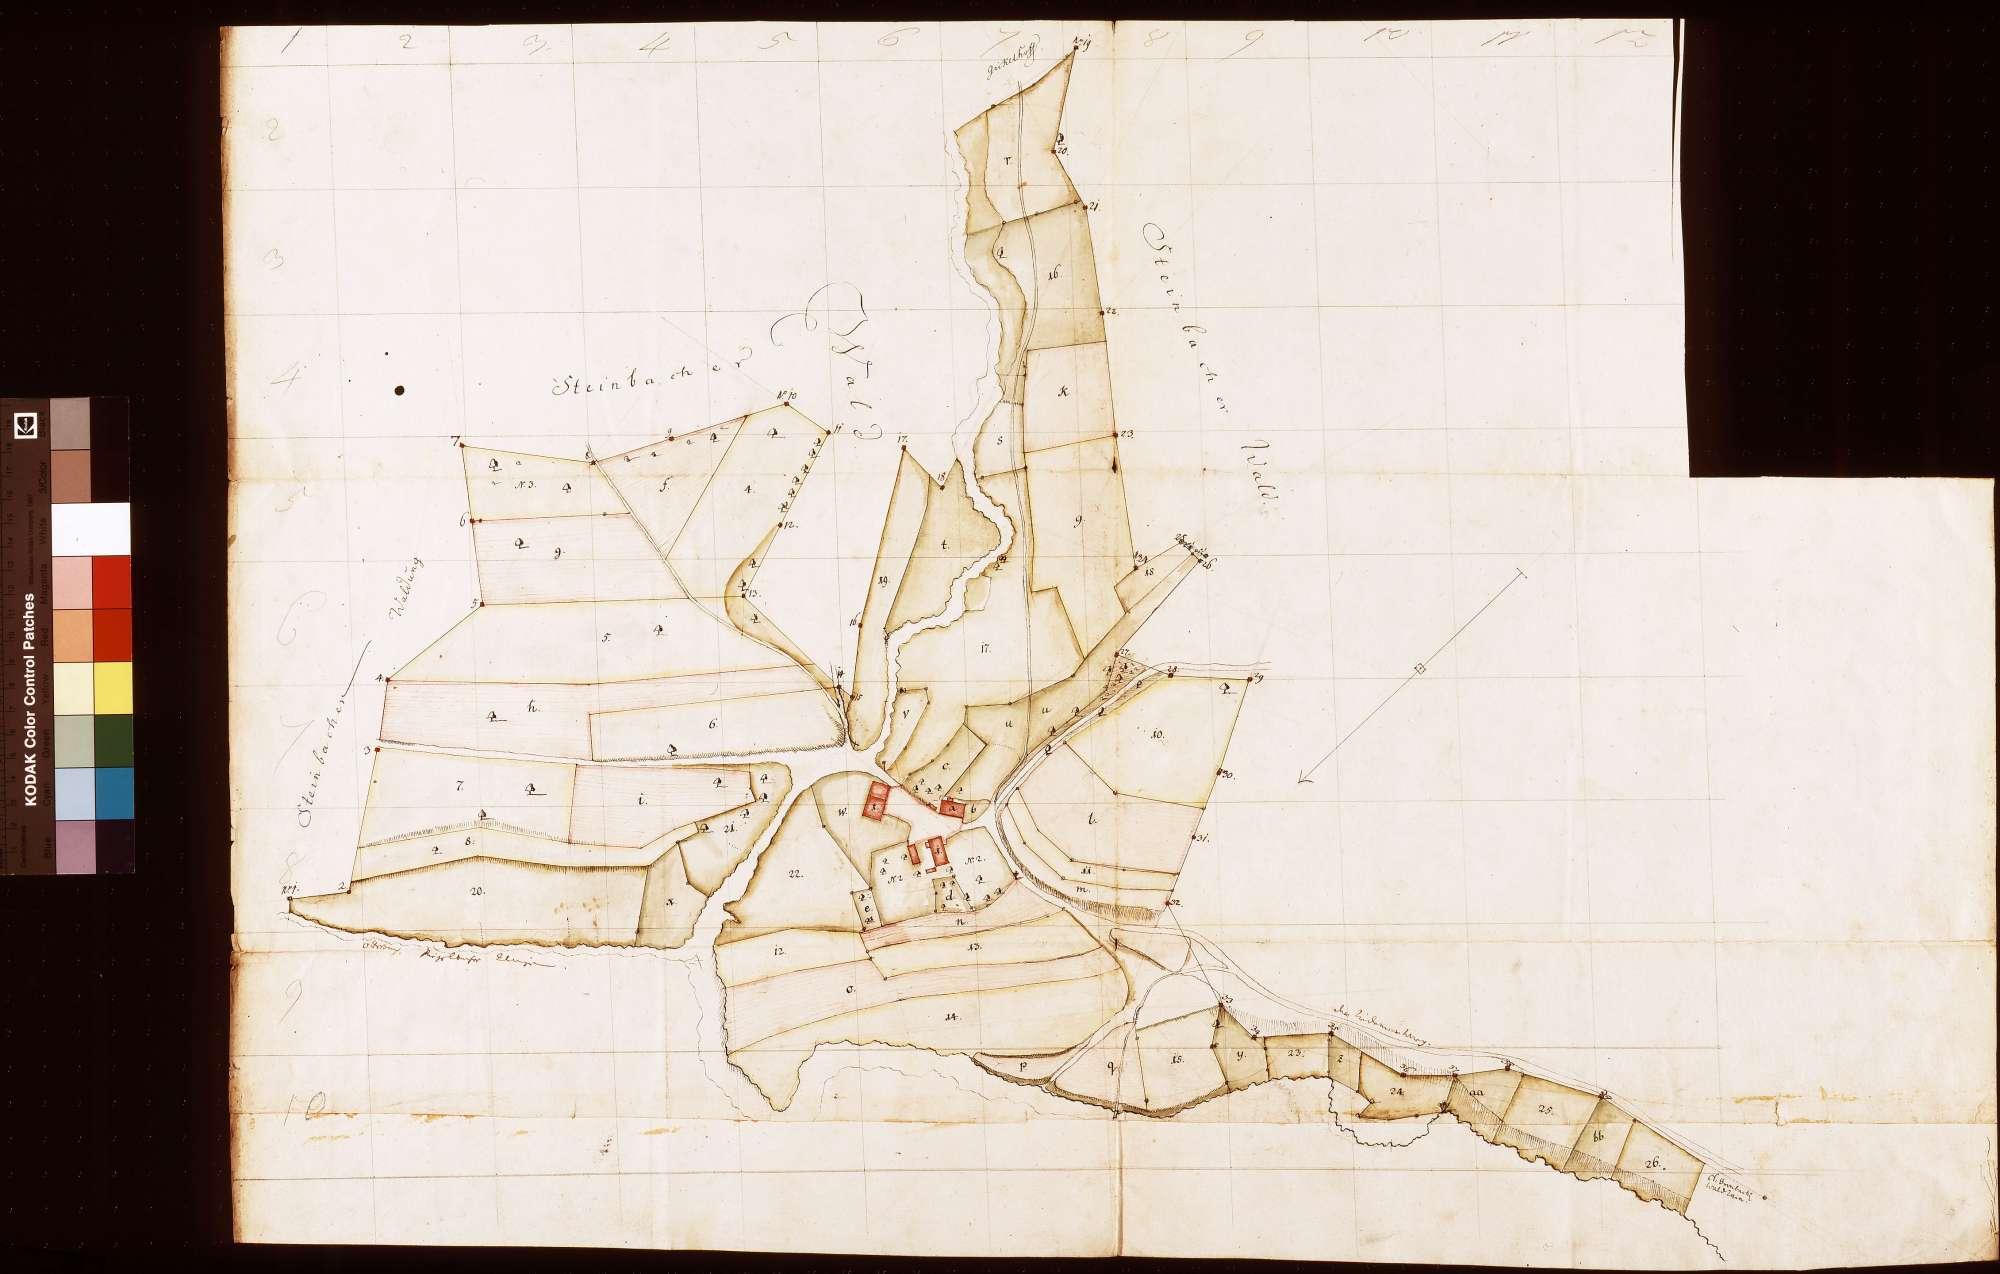 Otterhof (Inselkarte), Bild 1